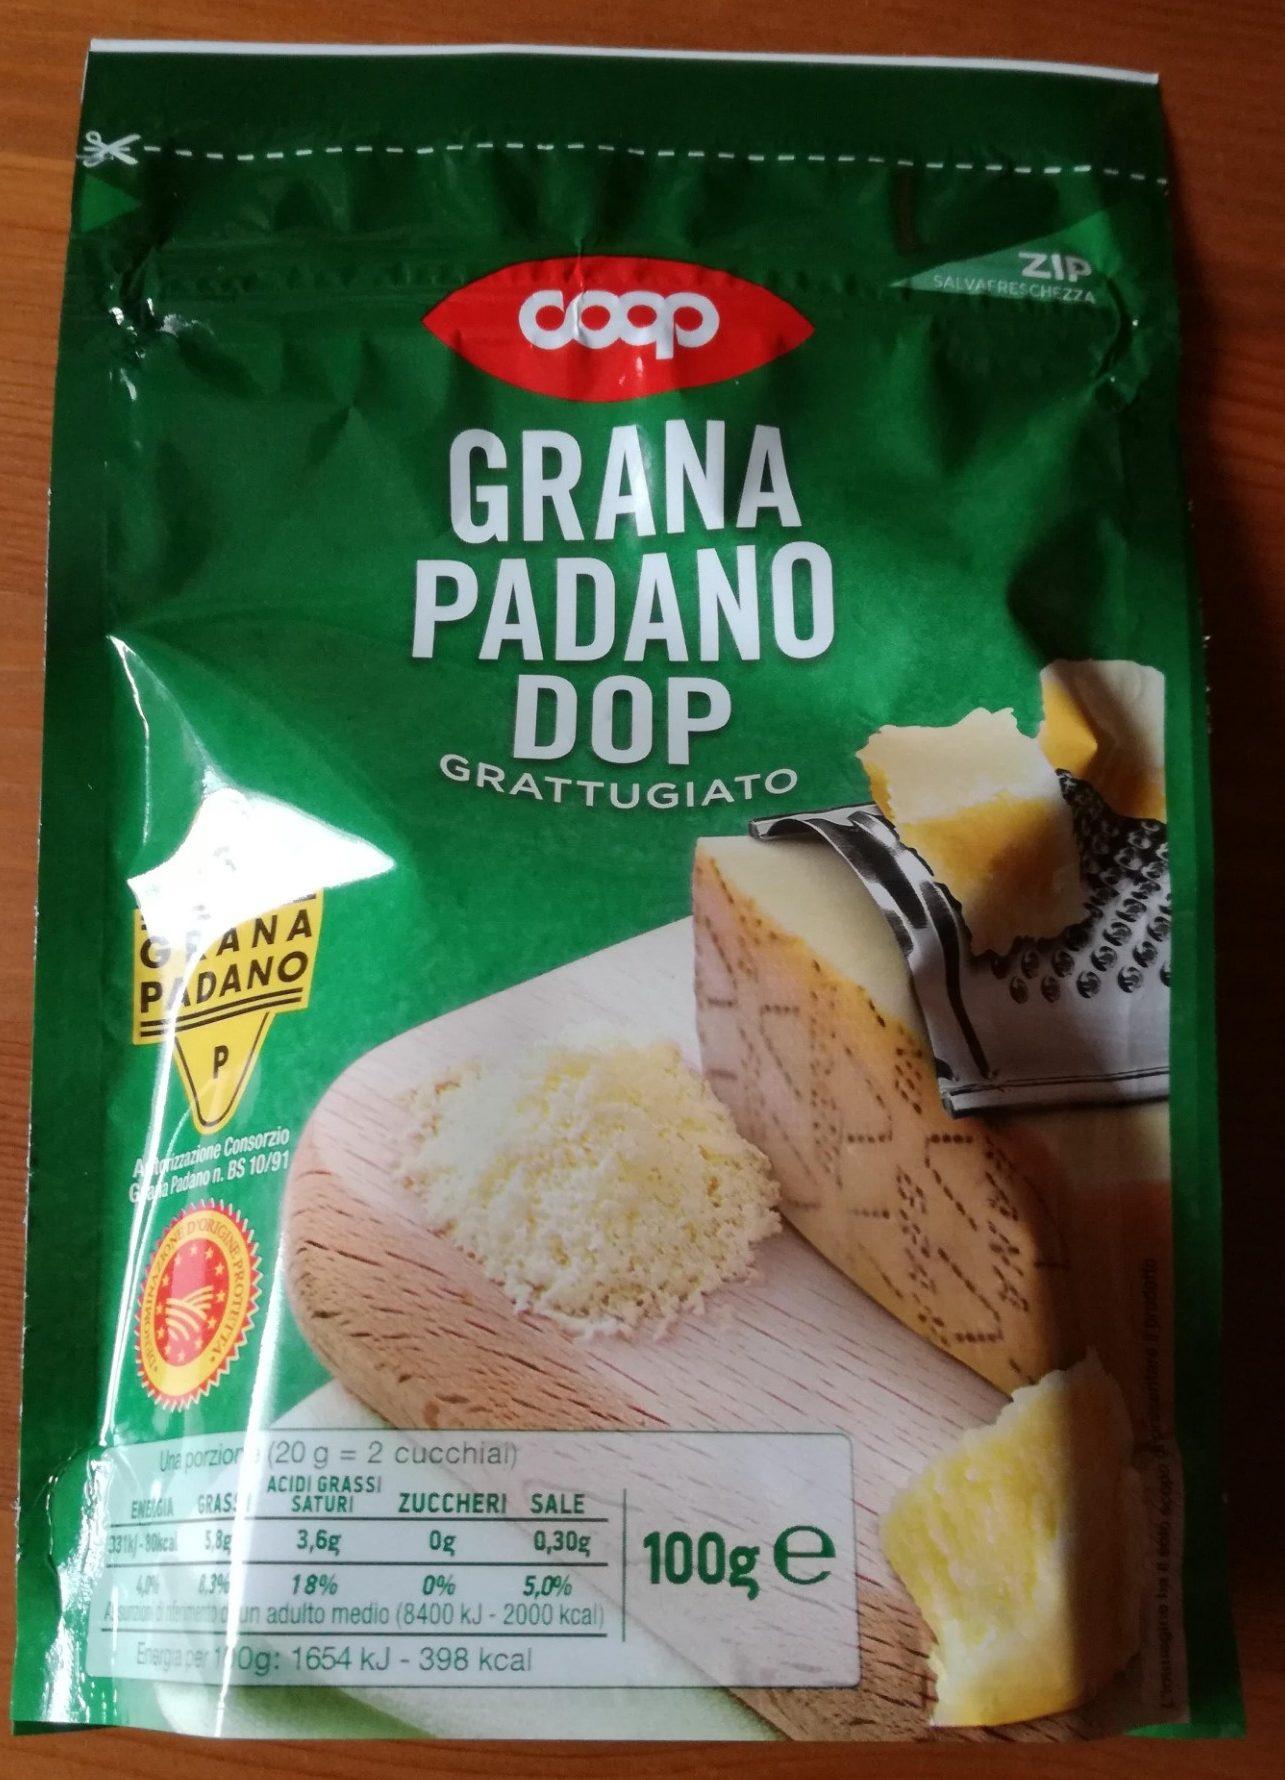 Grana Padano DOP grattugiato - Product - it